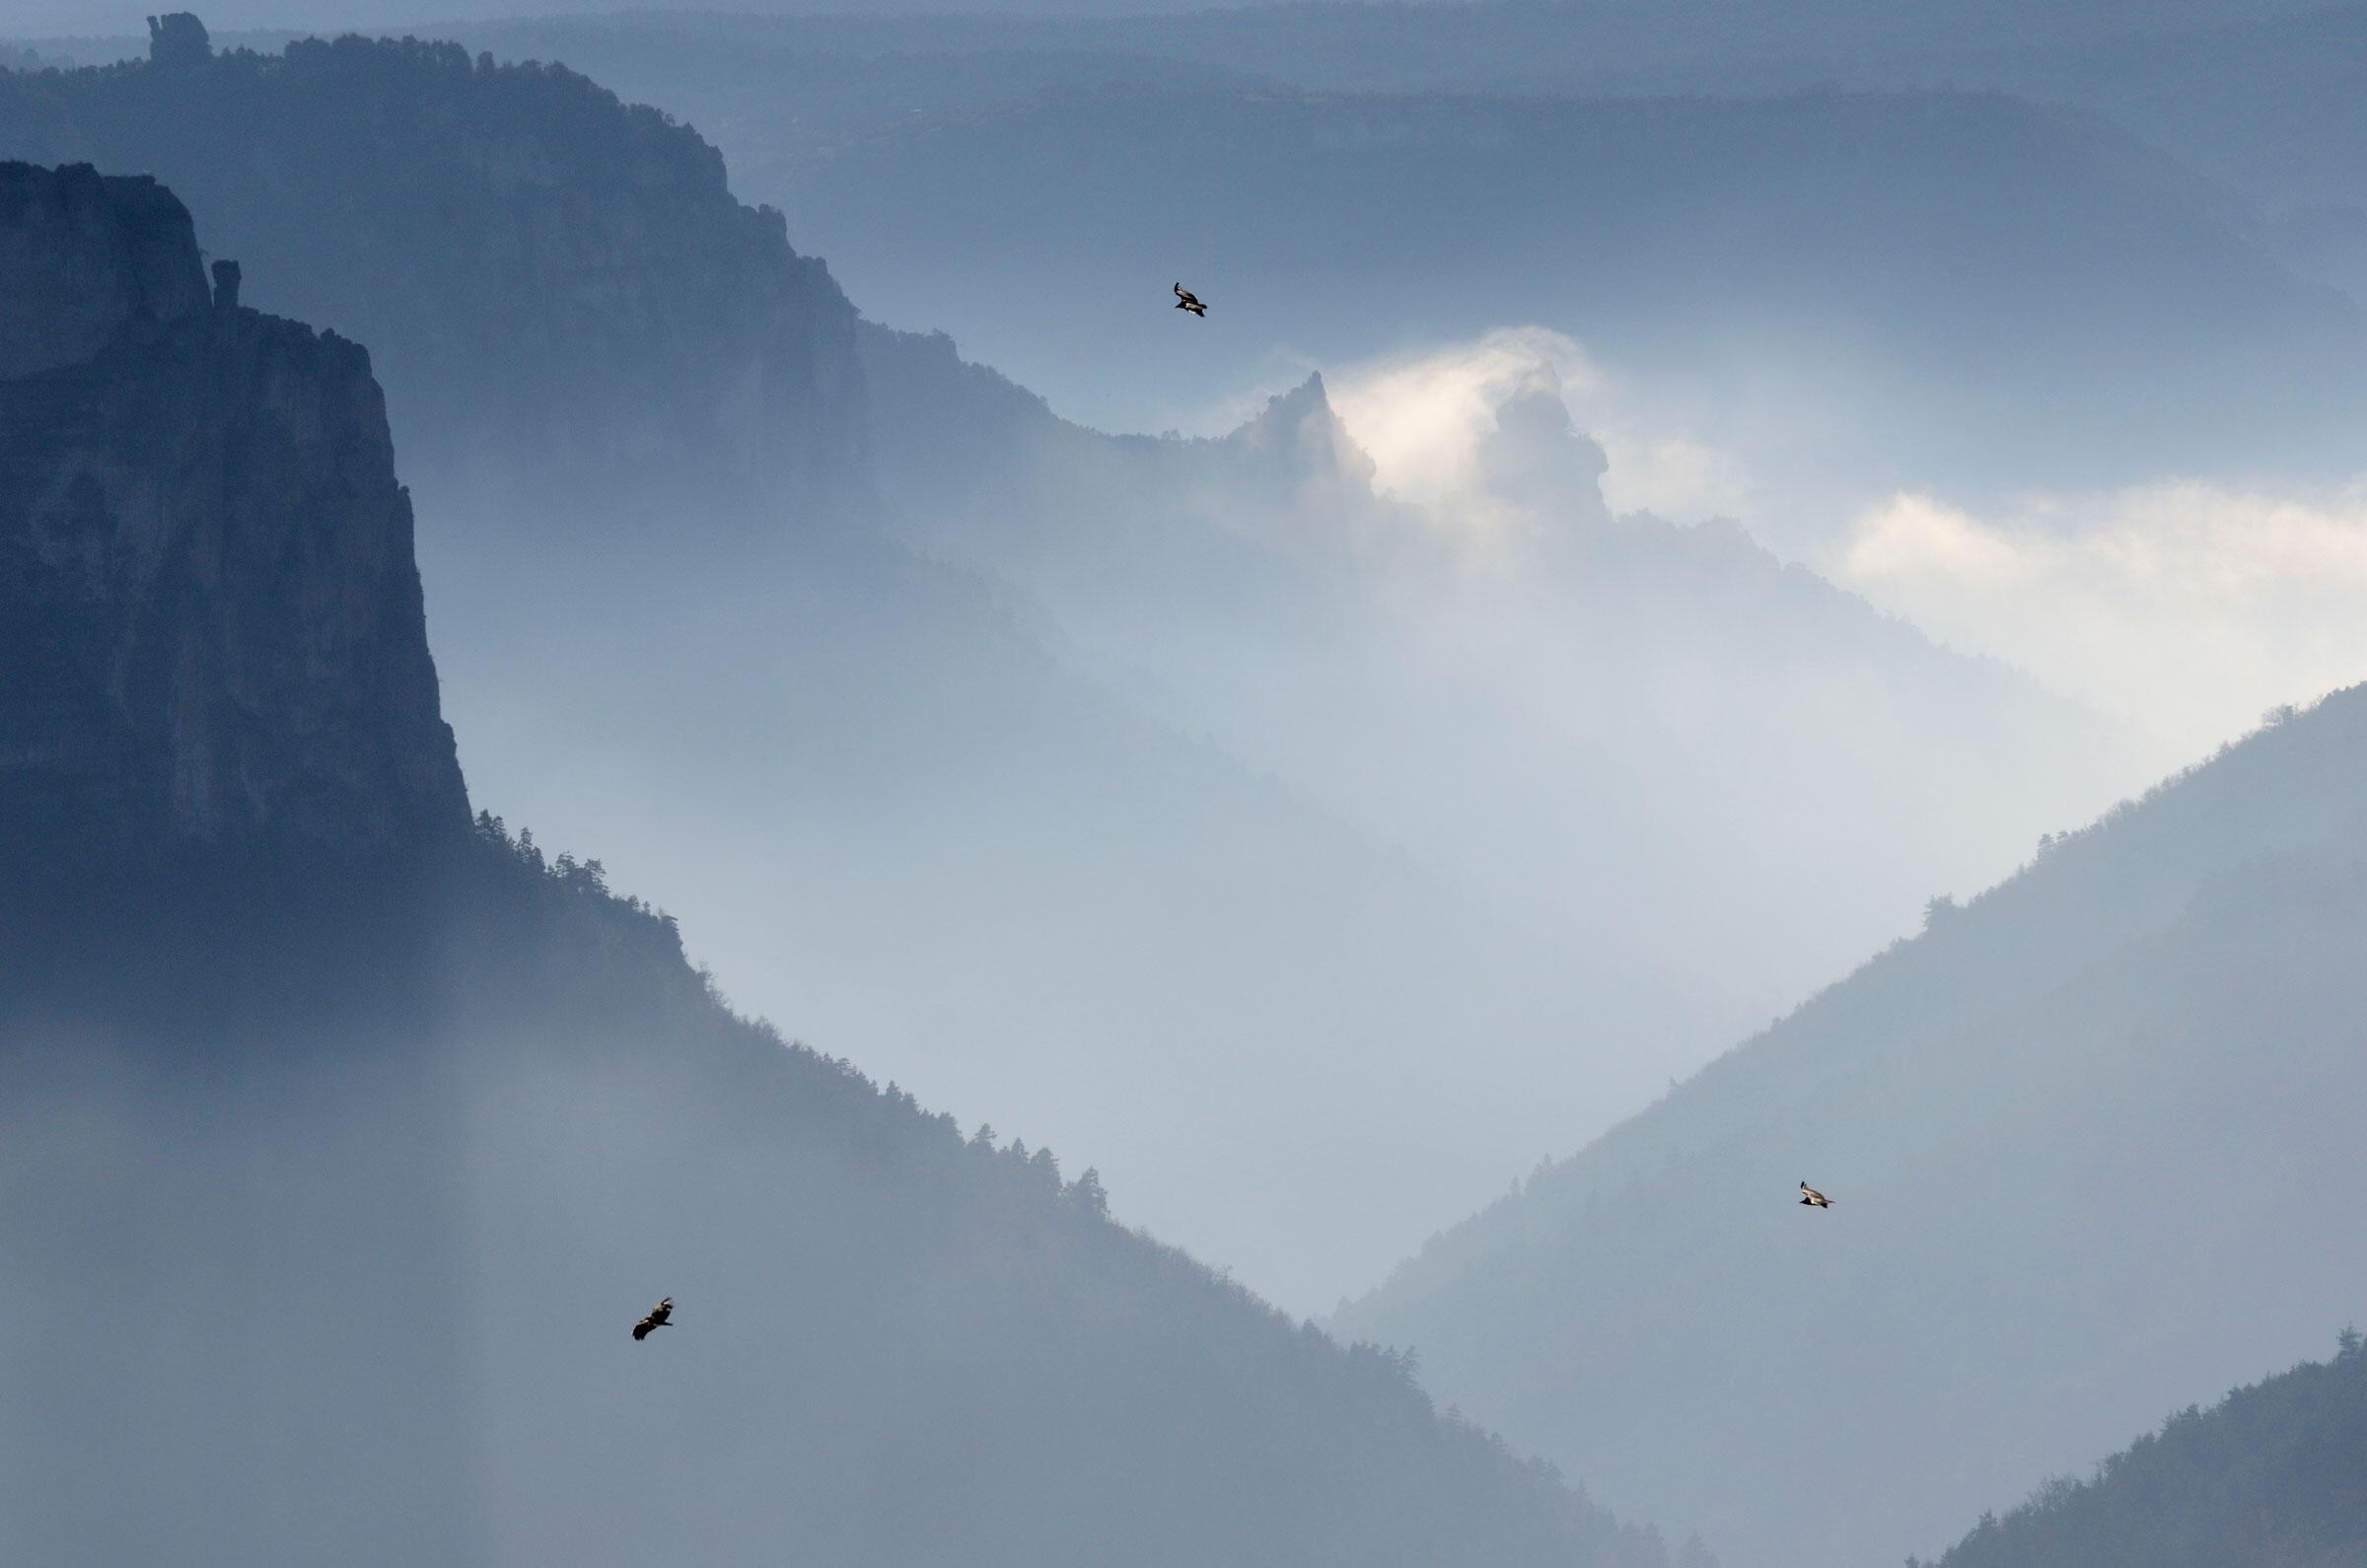 Eurasian Griffon Vultures. Fabrice Cahez/NPL/Minden Pictures